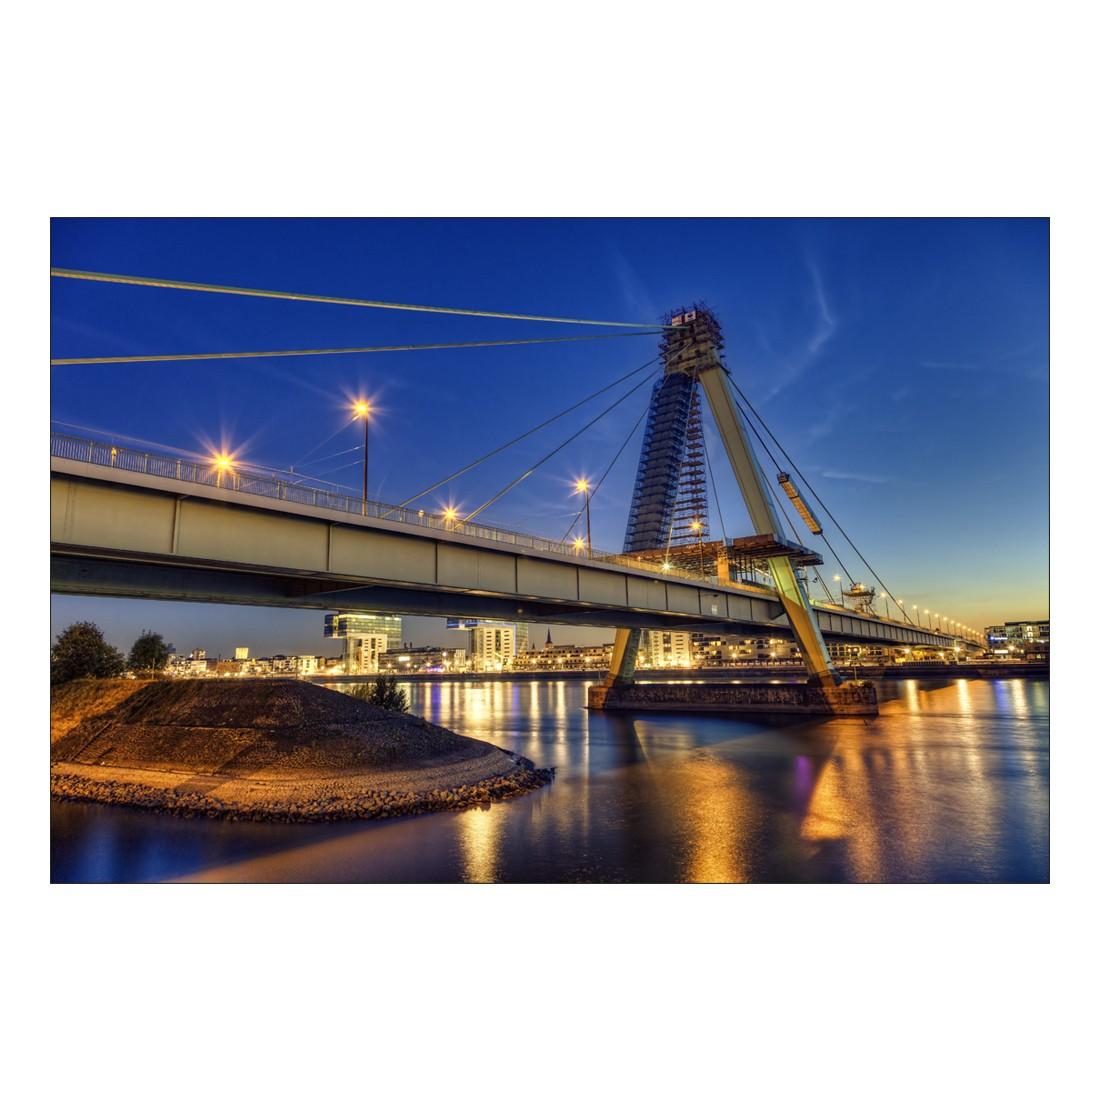 Acrylglasbild Severinsbrücke Köln – Abmessung 30×20 cm, Gallery of Innovative Art günstig online kaufen